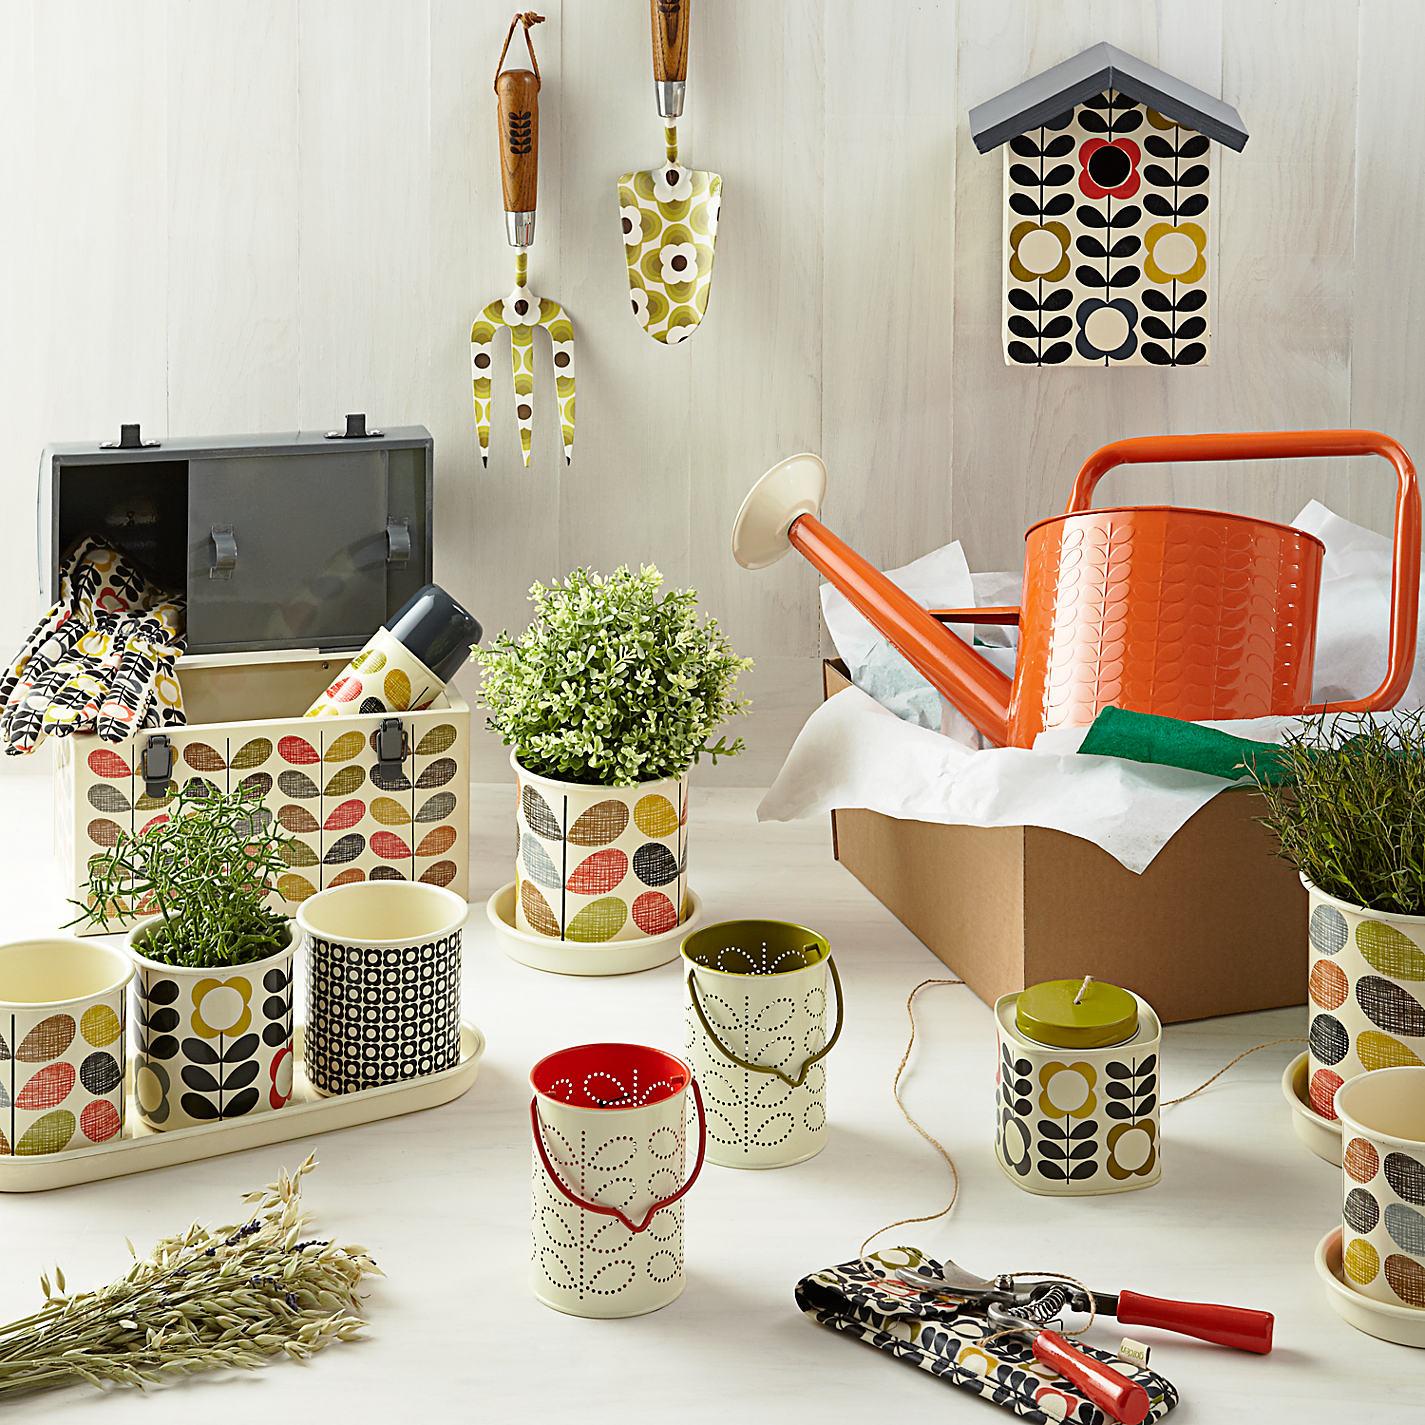 garden design: garden design with gift ideas for gardening moms